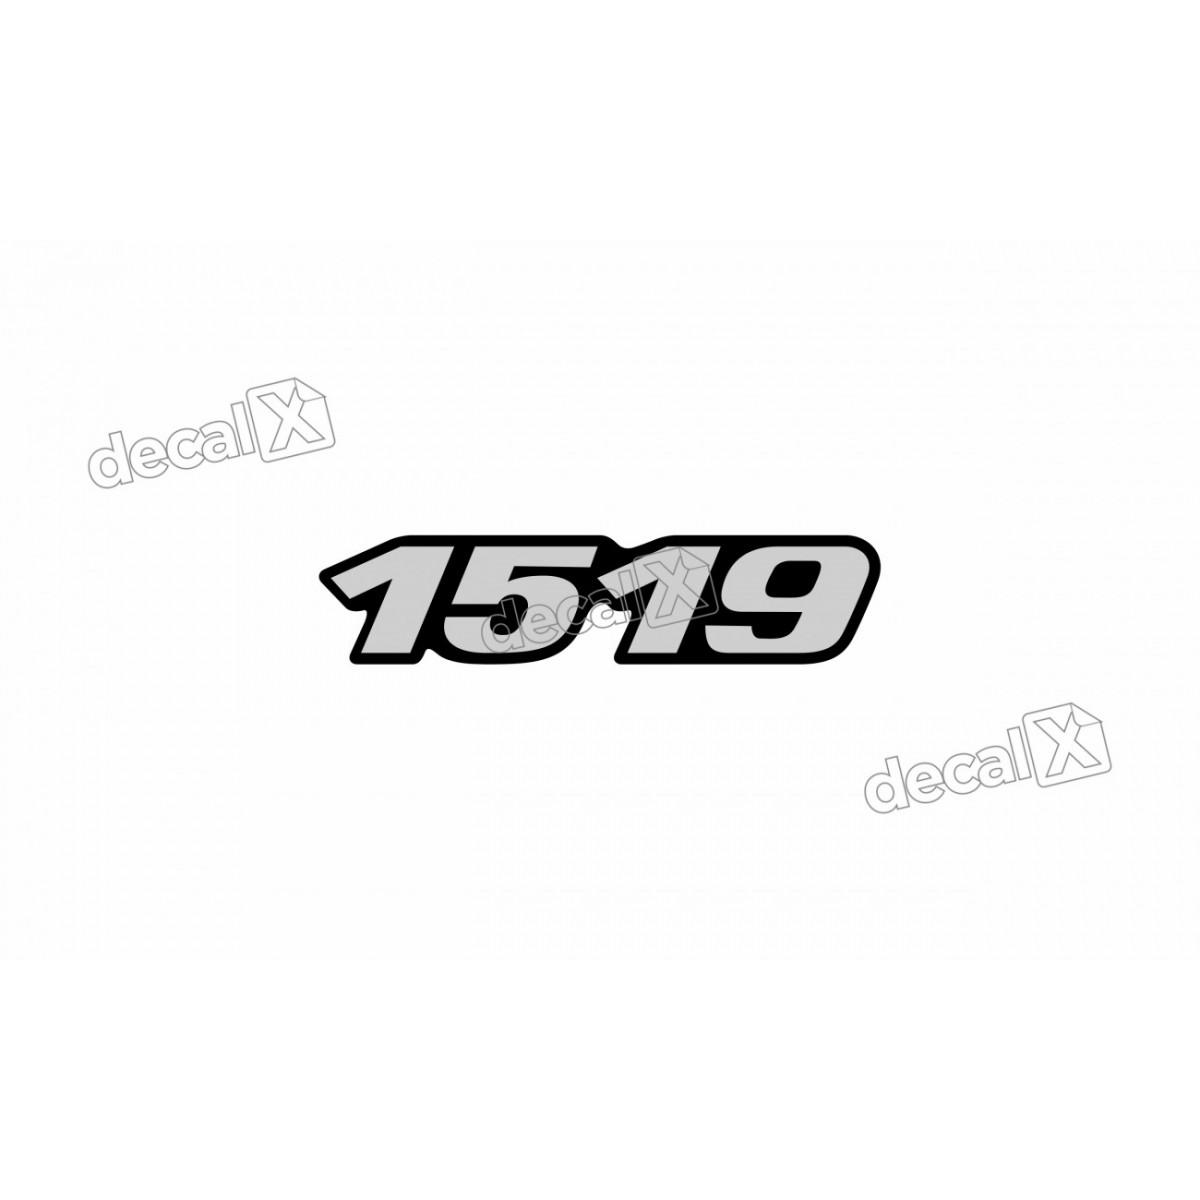 Adesivo Emblema Resinado Mercedes 1519 Cm38 Decalx